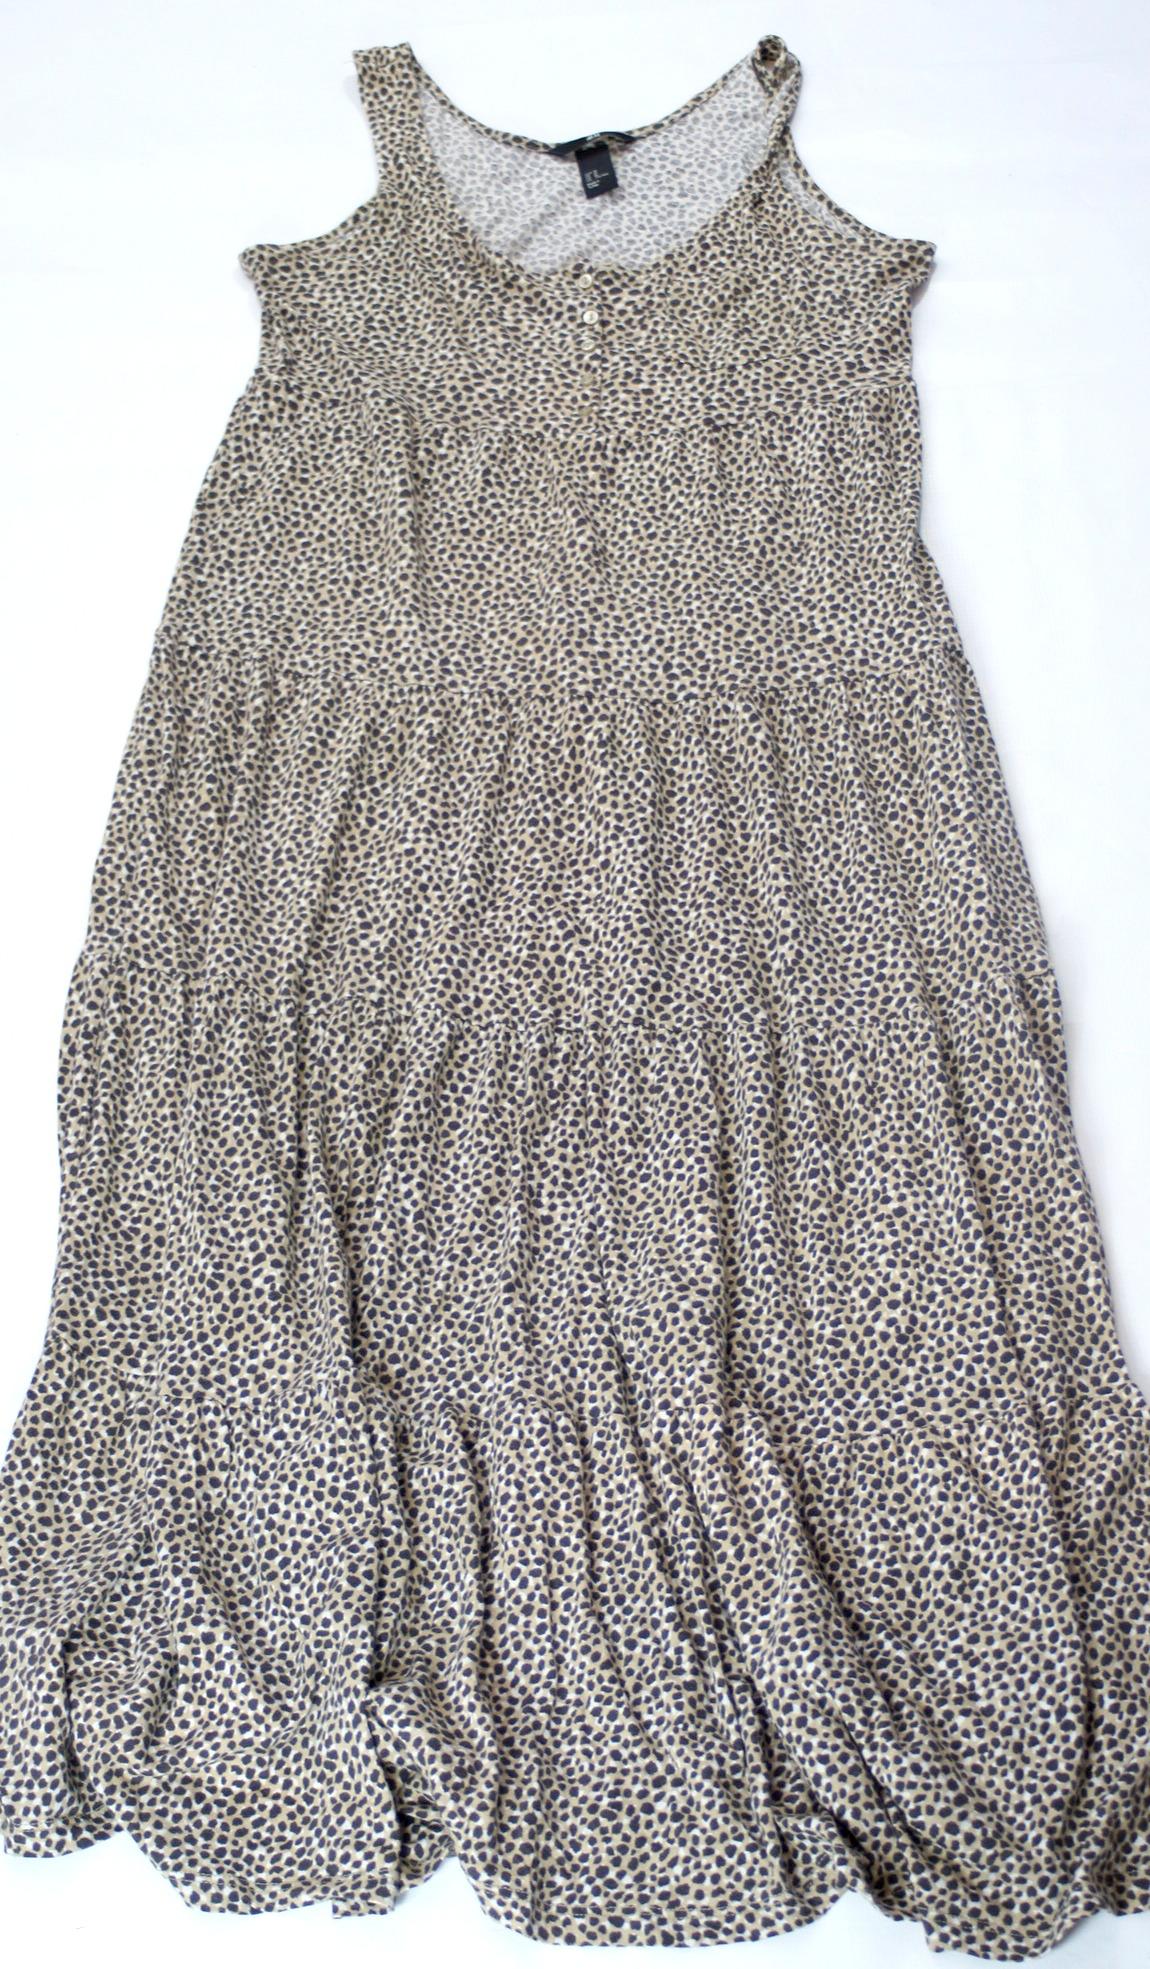 6350feff2c H M sukienka panterka długa wygodna r 38 - 7050026286 - oficjalne ...